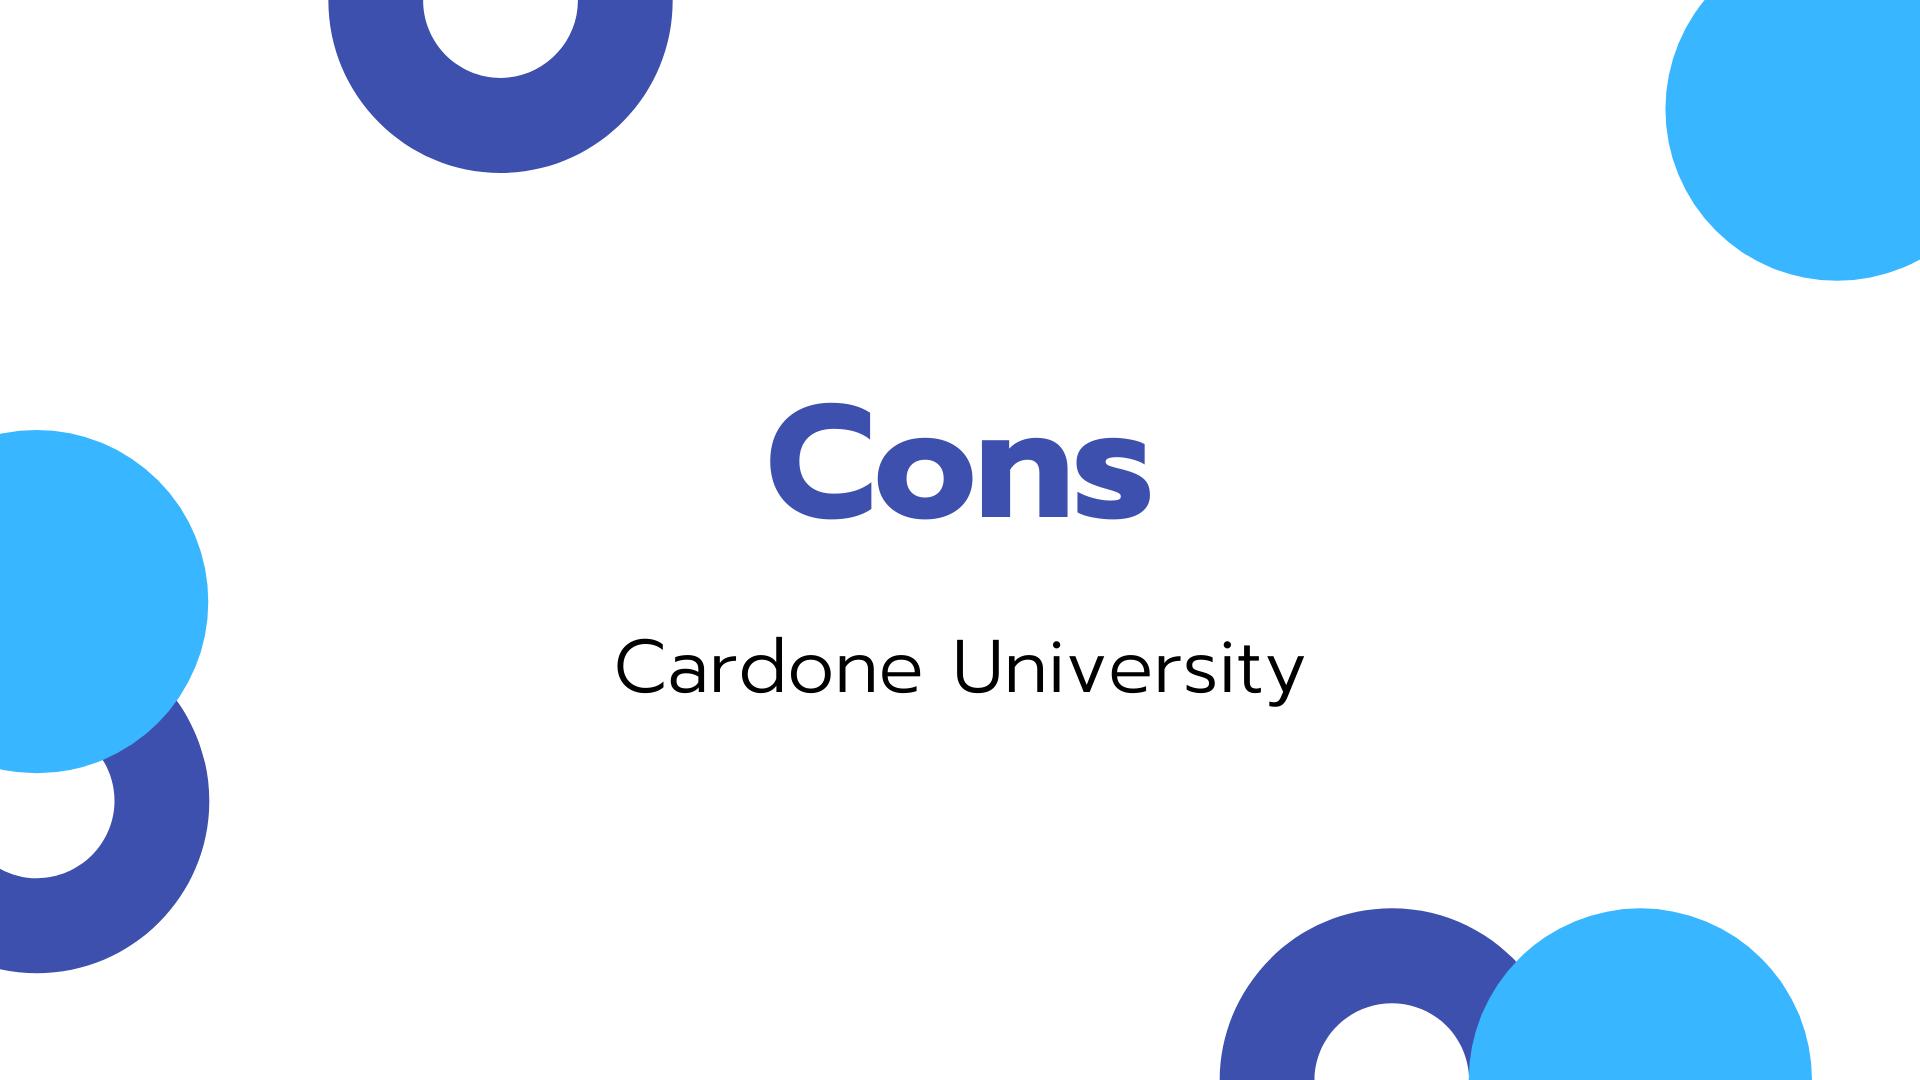 The cons of Cardone University